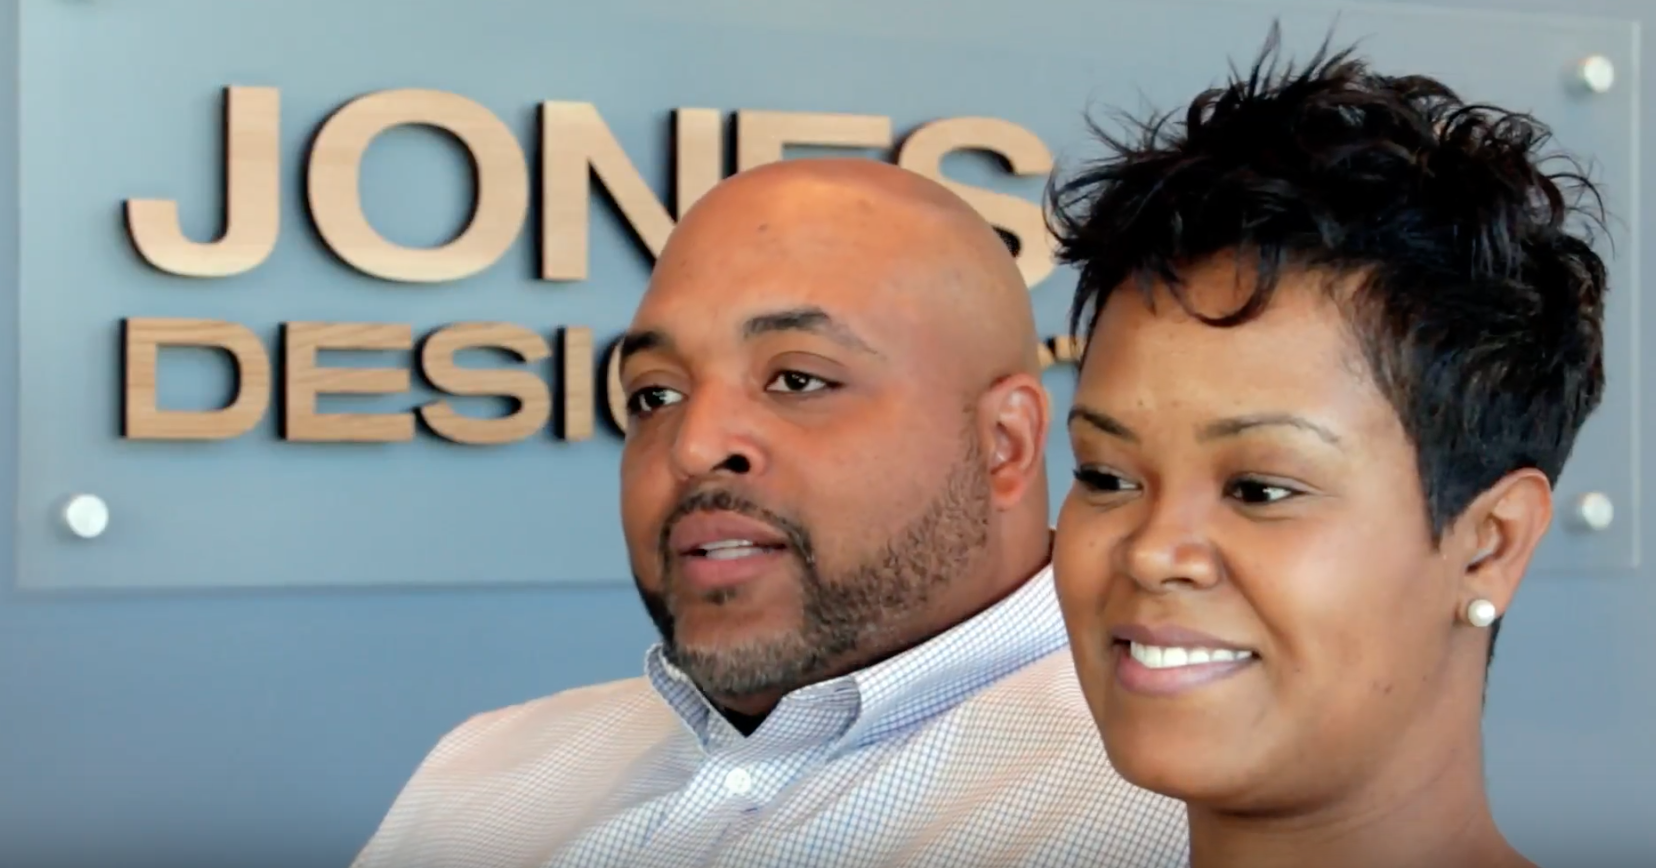 The Perkins Testimonial Video